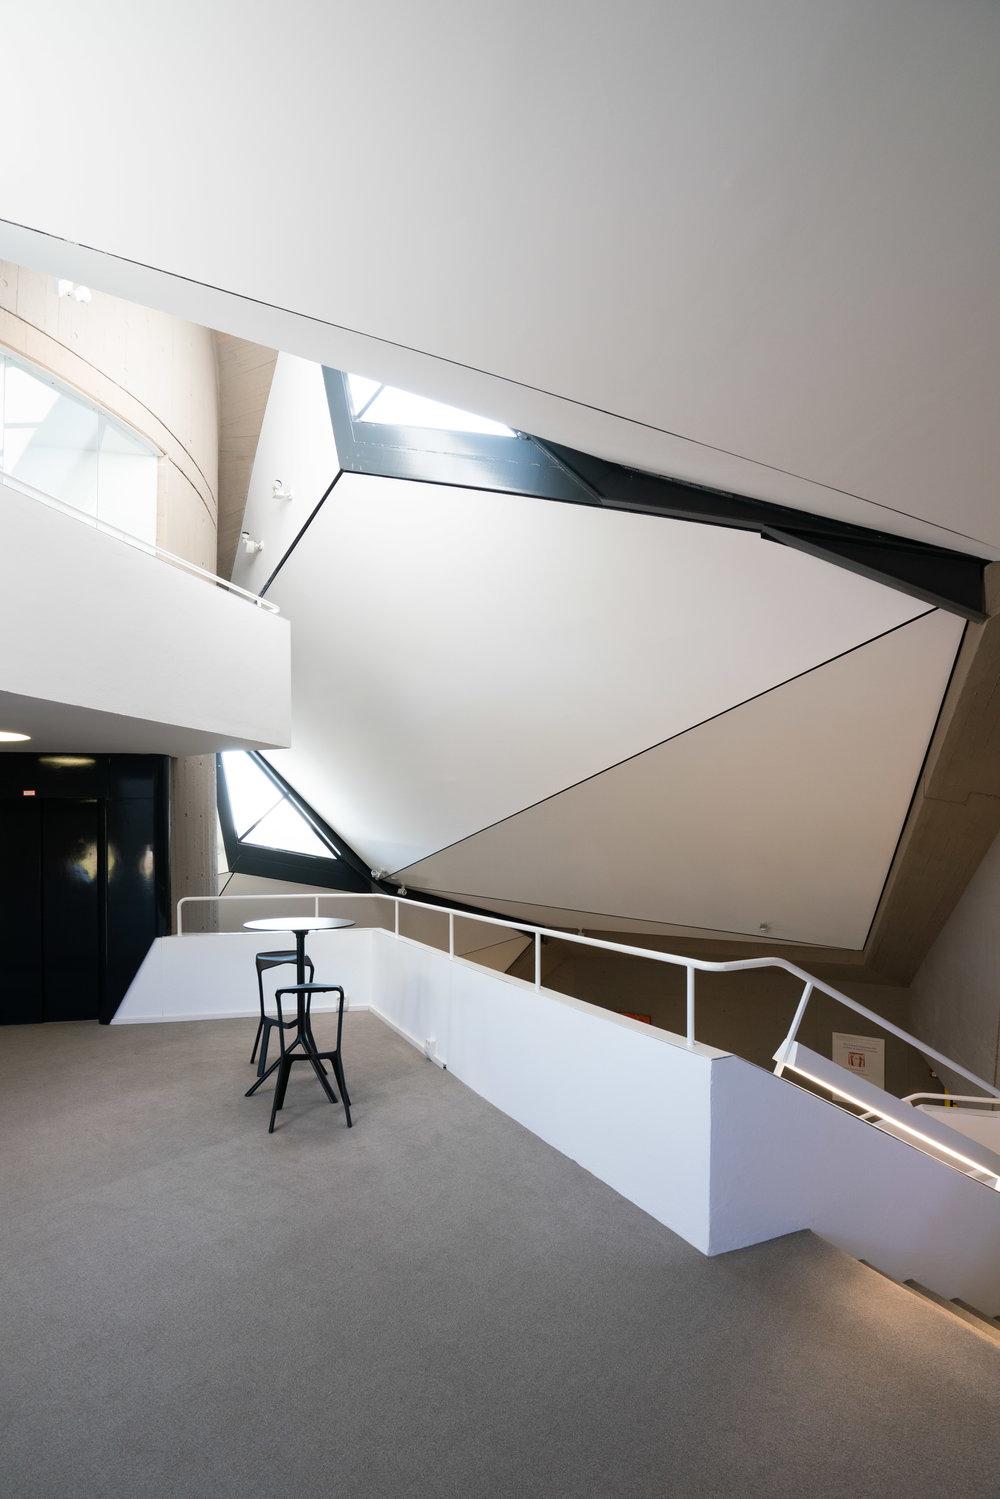 181012_Fehling+Gogel, Max Planck Institute_25.jpg